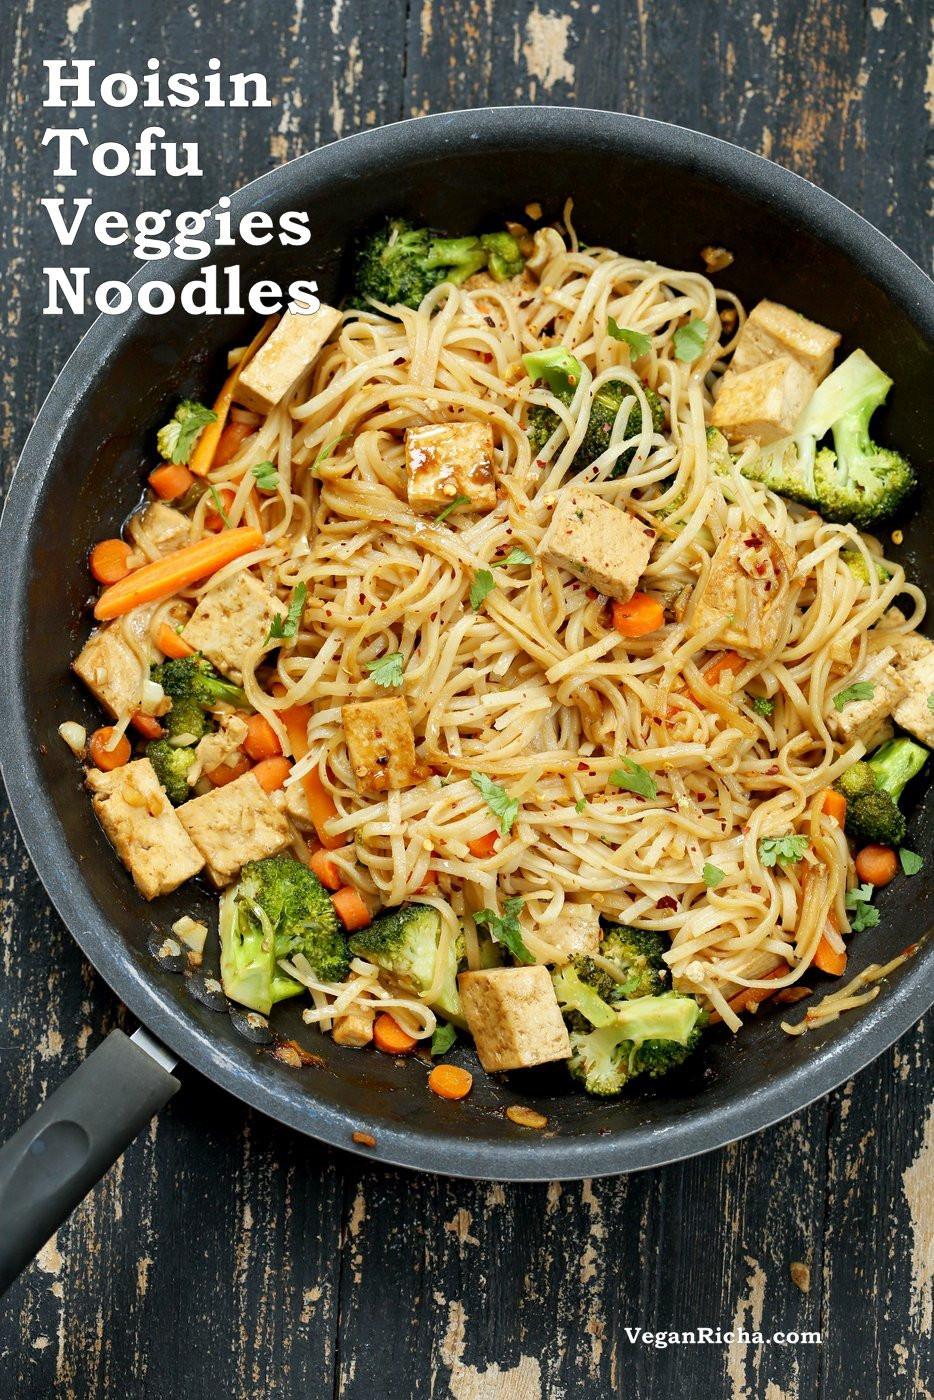 Vegan Rice Noodle Recipes  Tofu and Brown Rice Noodles in Hoisin Sauce Vegan Richa